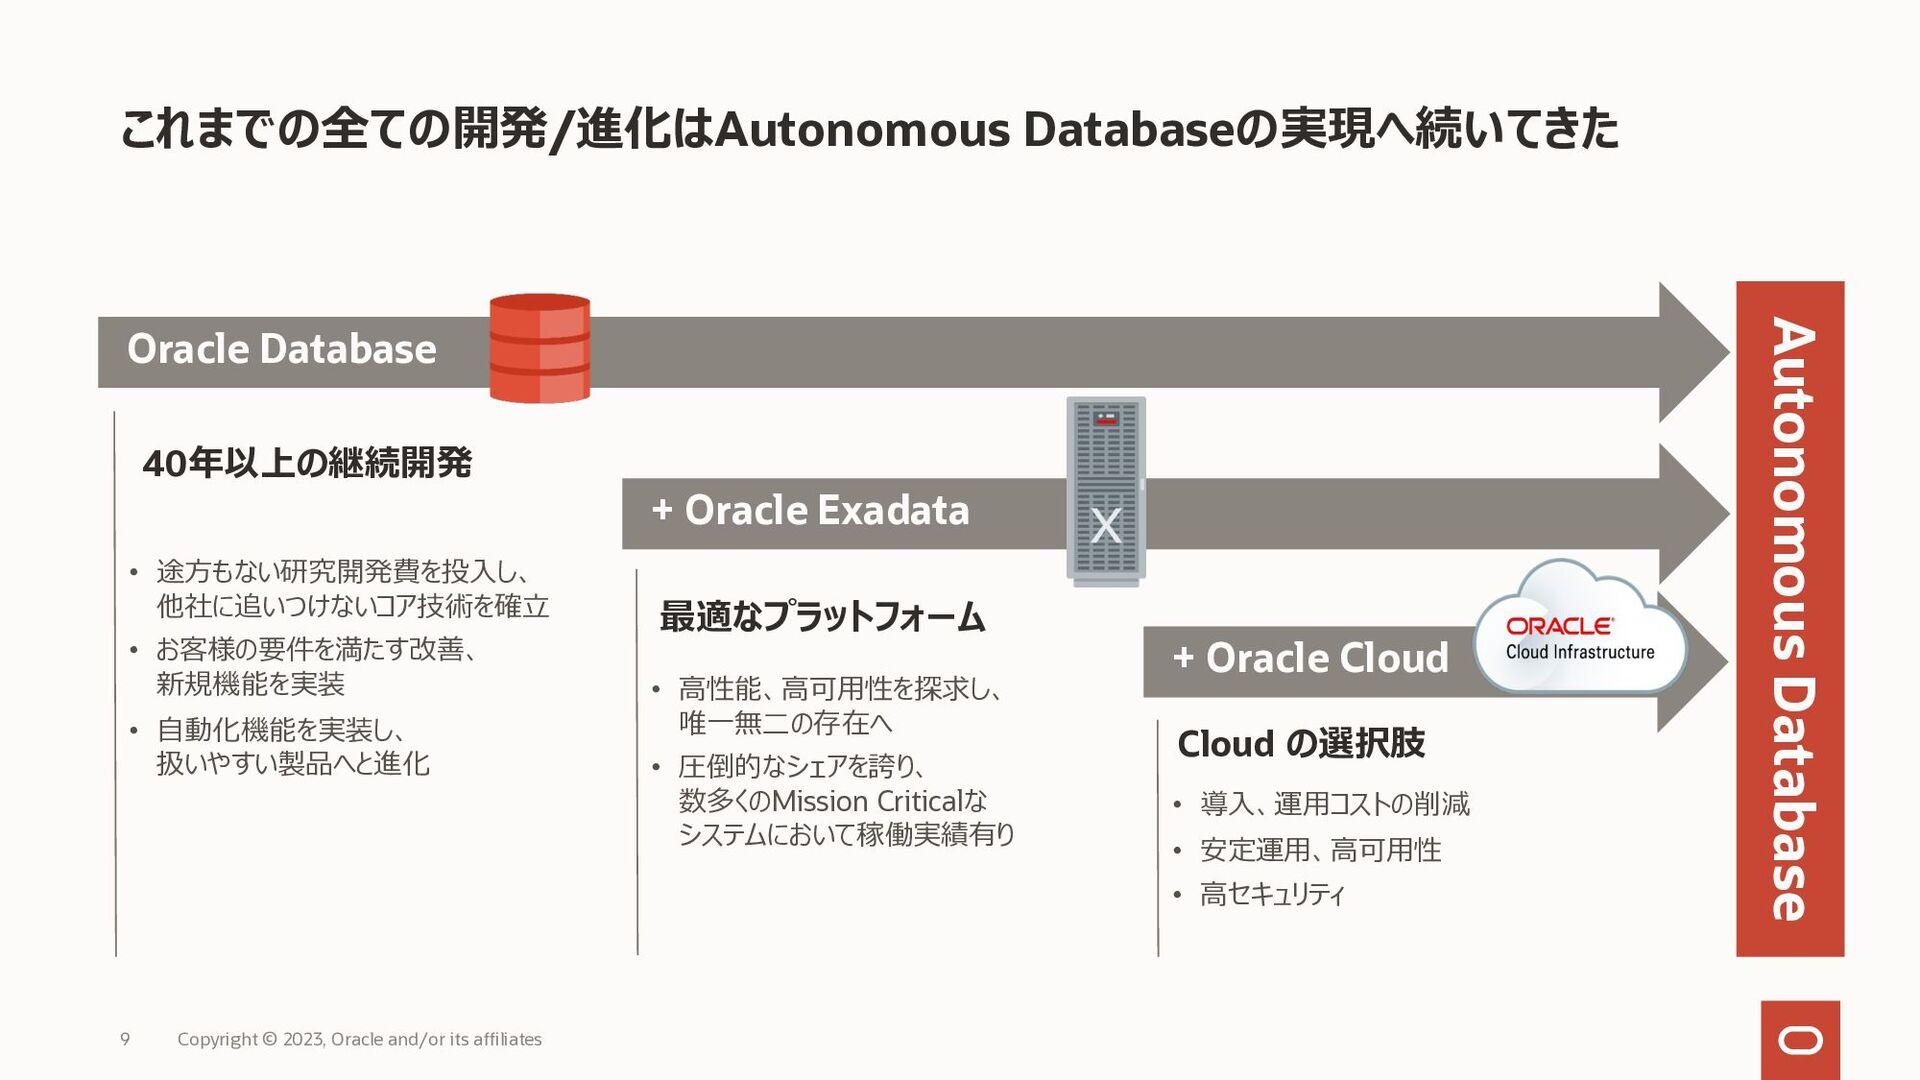 Autonomous Databaseが実現する世界 現時点で最高な構成。今後もさらなる進化を...